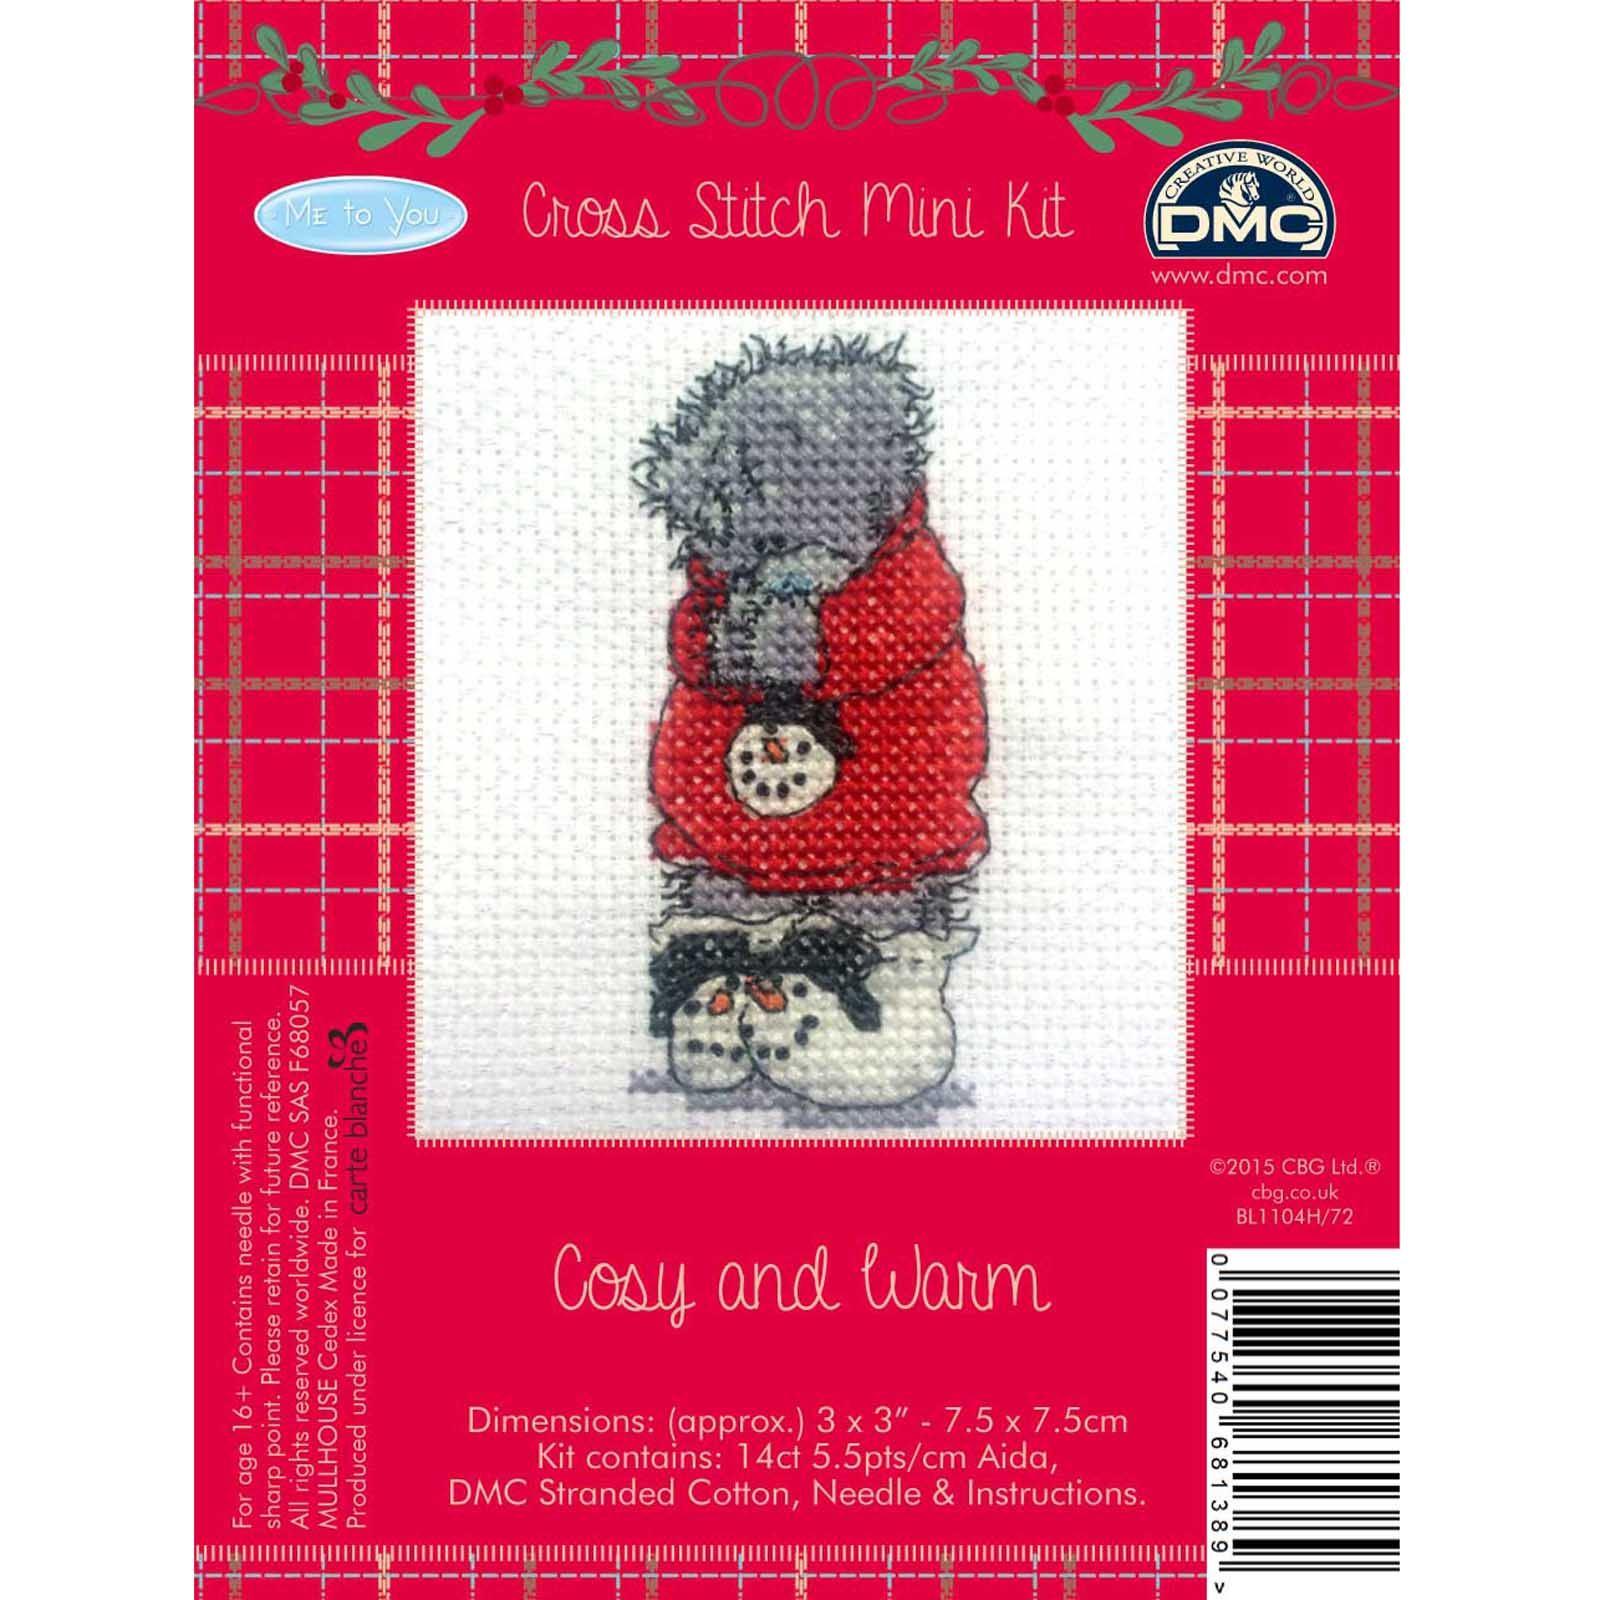 DMC-Me-to-You-Tatty-Teddy-Christmas-Mini-Cross-Stitch-Kits-8-Designs thumbnail 9